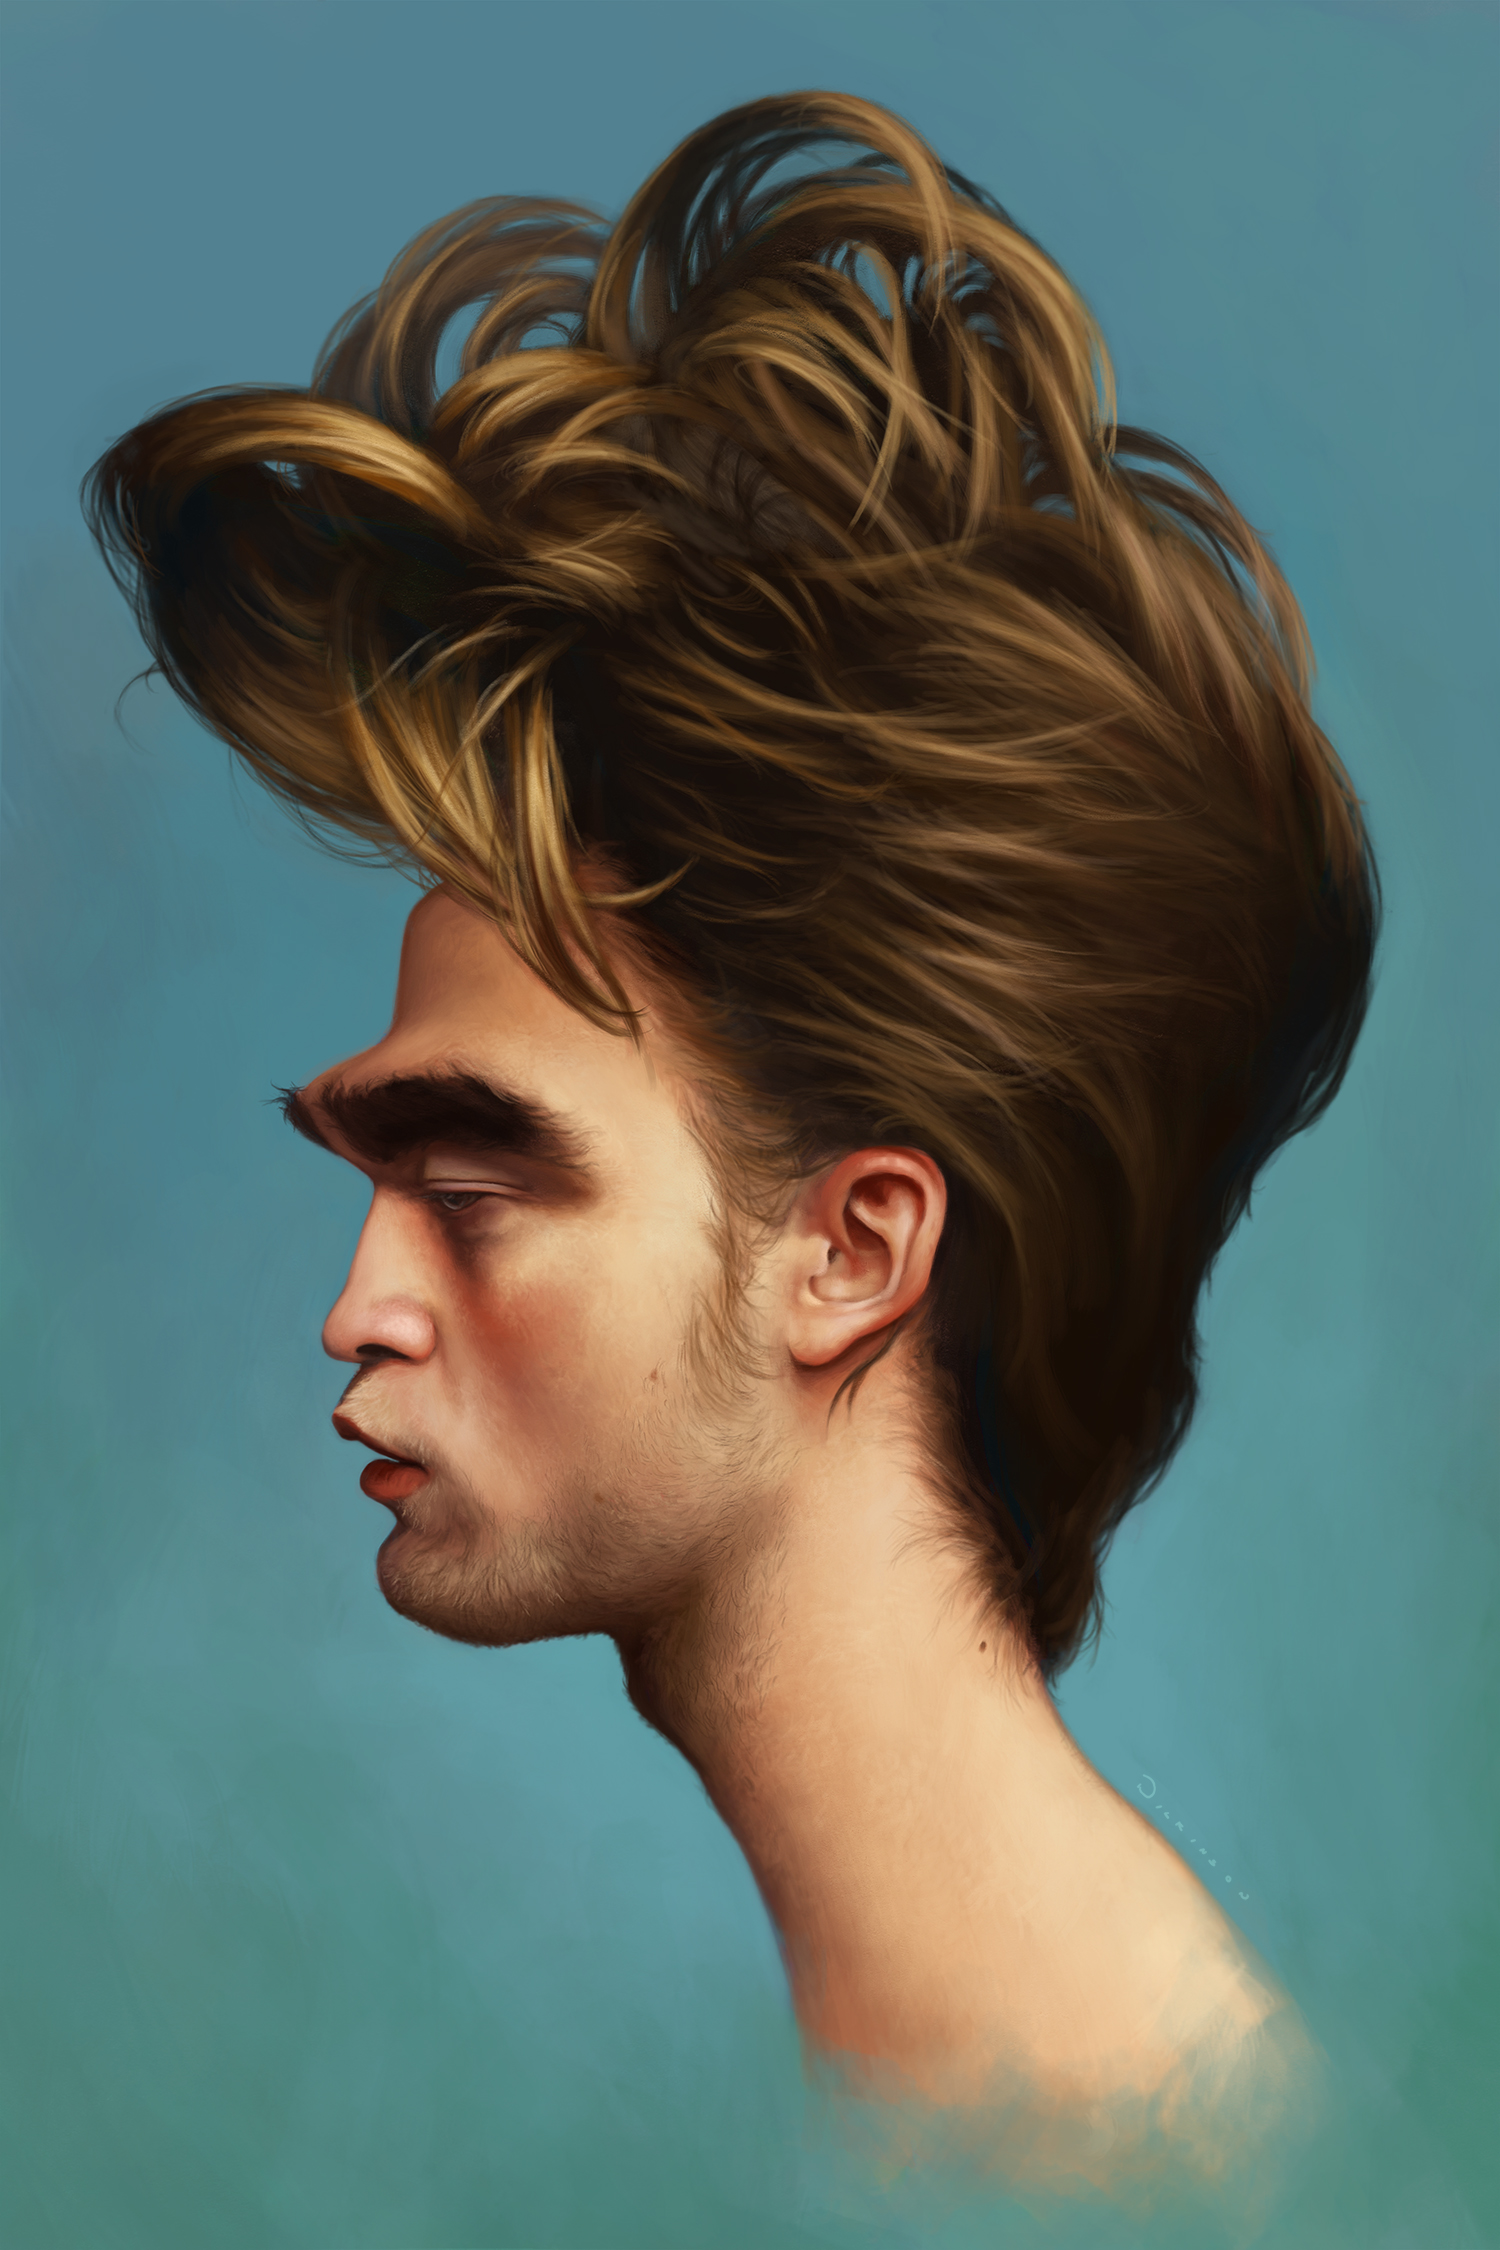 Robert Pattinson Caricature